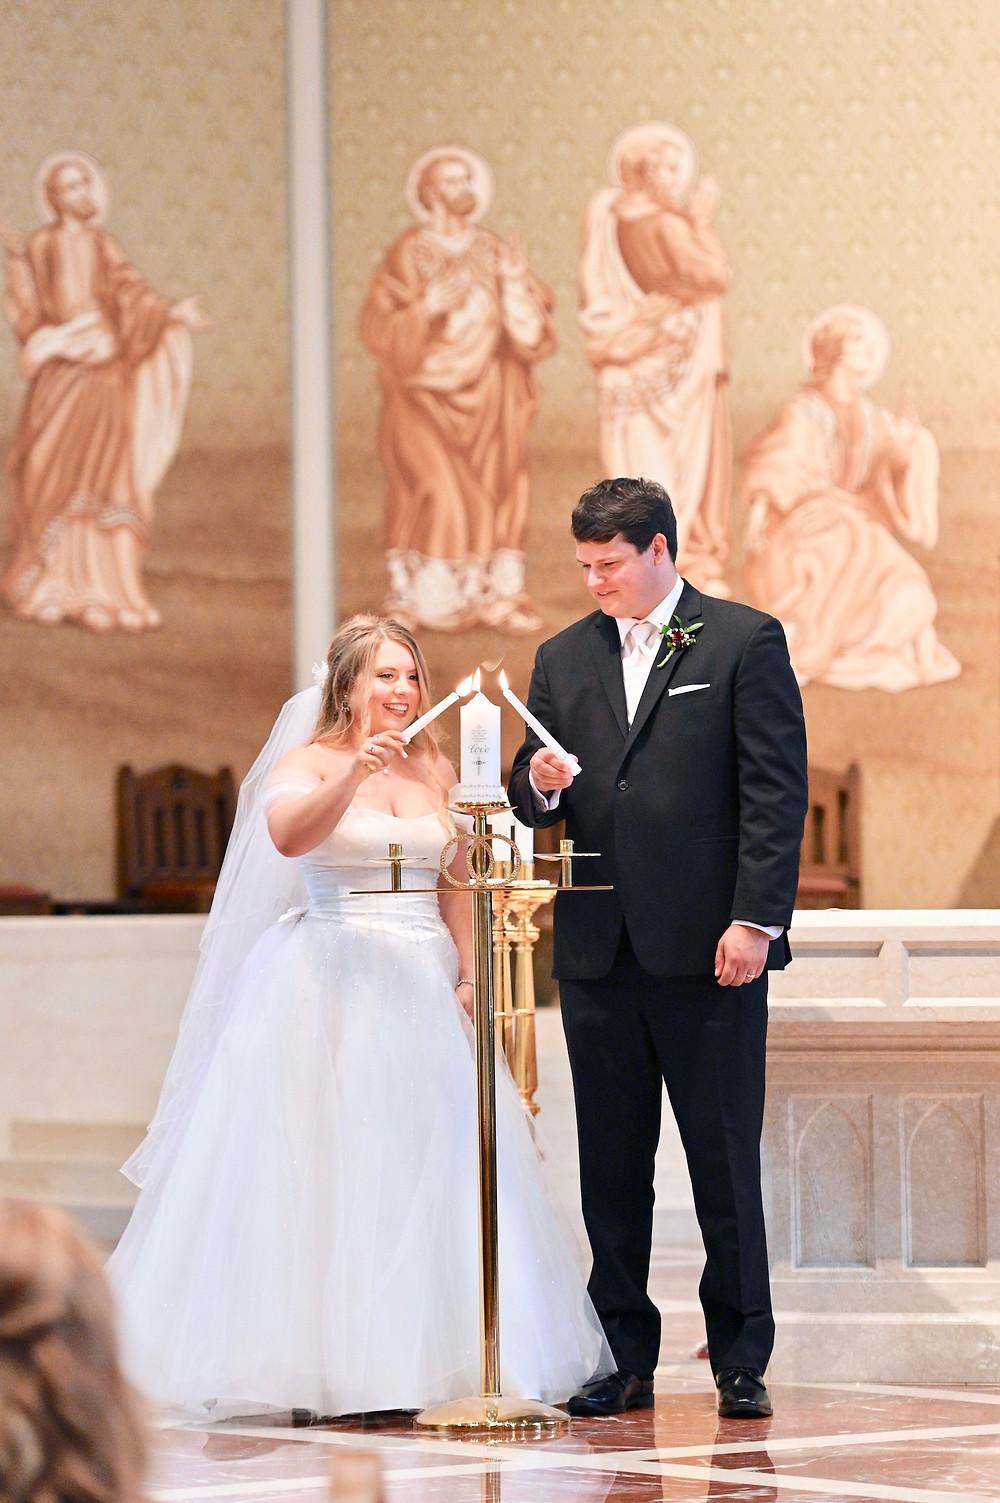 Unity Candle Lafayette Indiana Wedding Photographer Photography